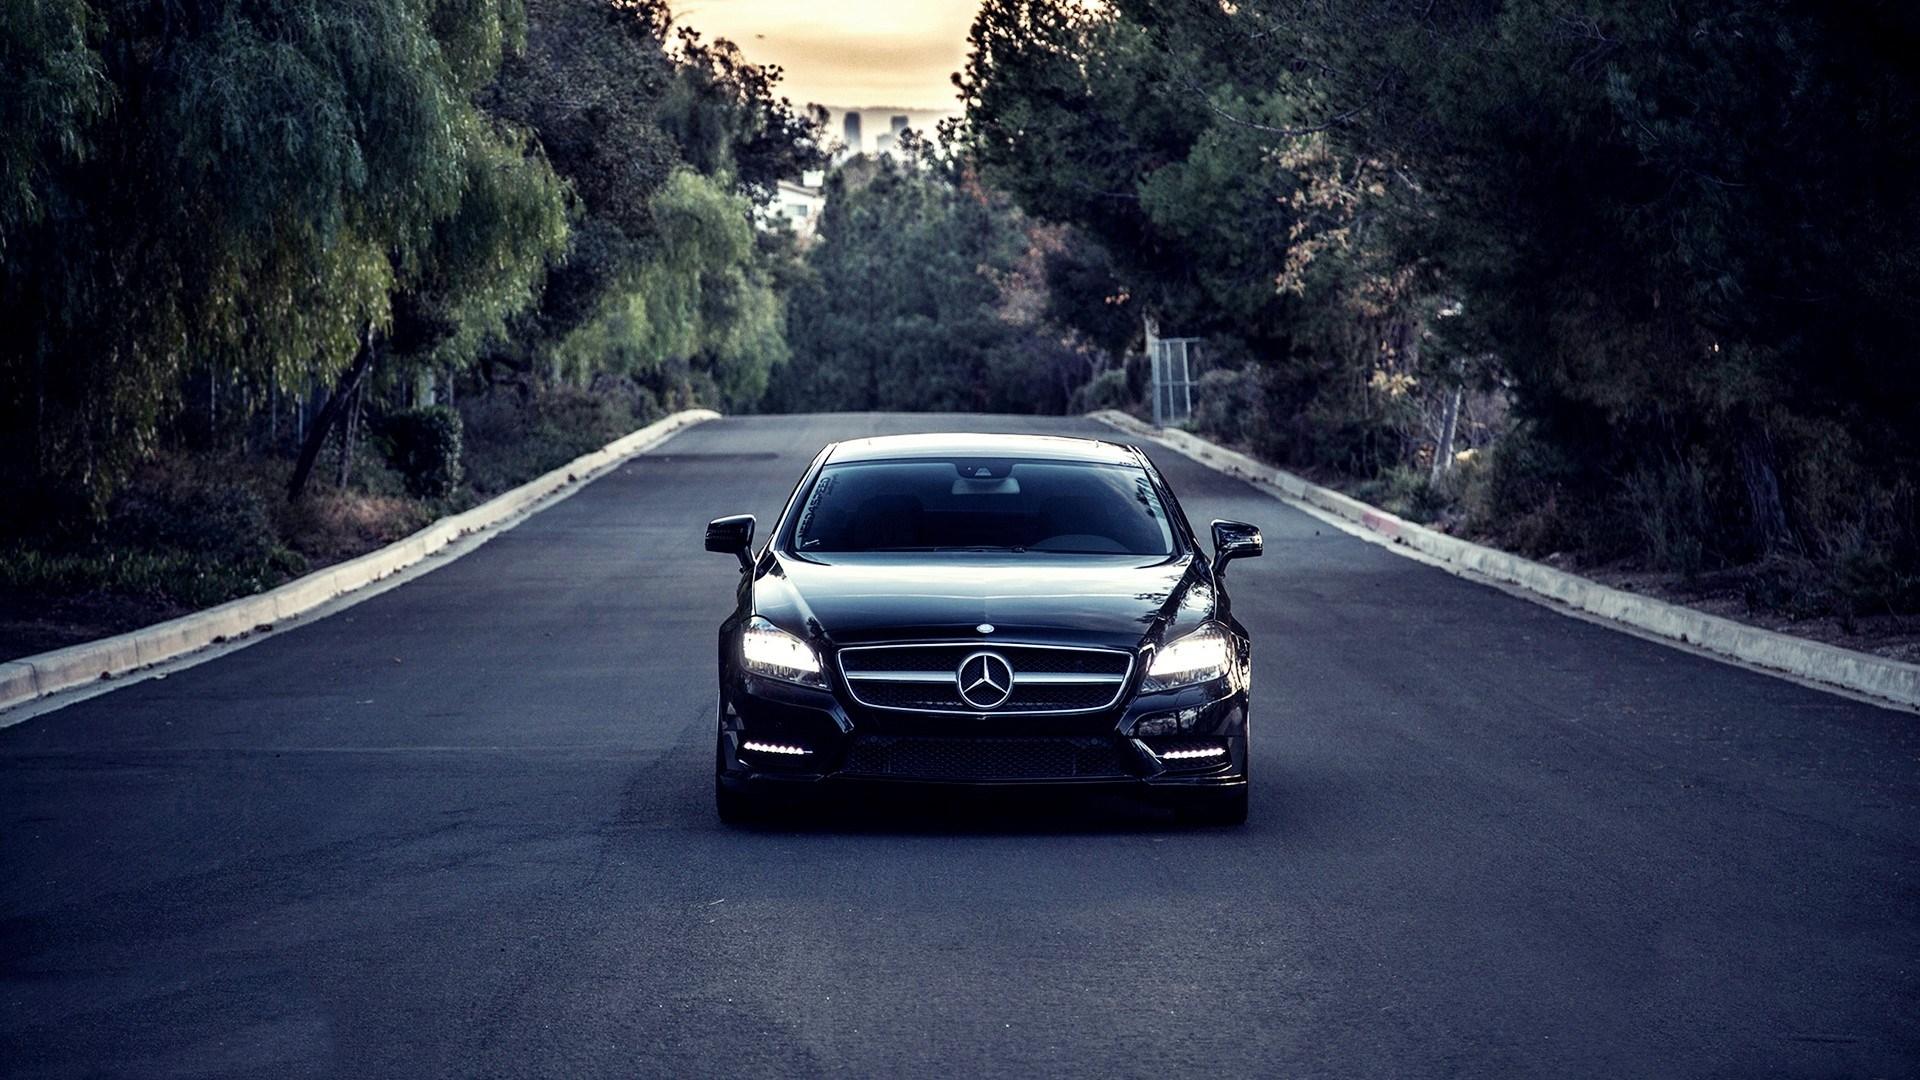 Free Download Mercedes Benz Cls550 Vossen Hd Wallpaper 1920x1080 Images, Photos, Reviews